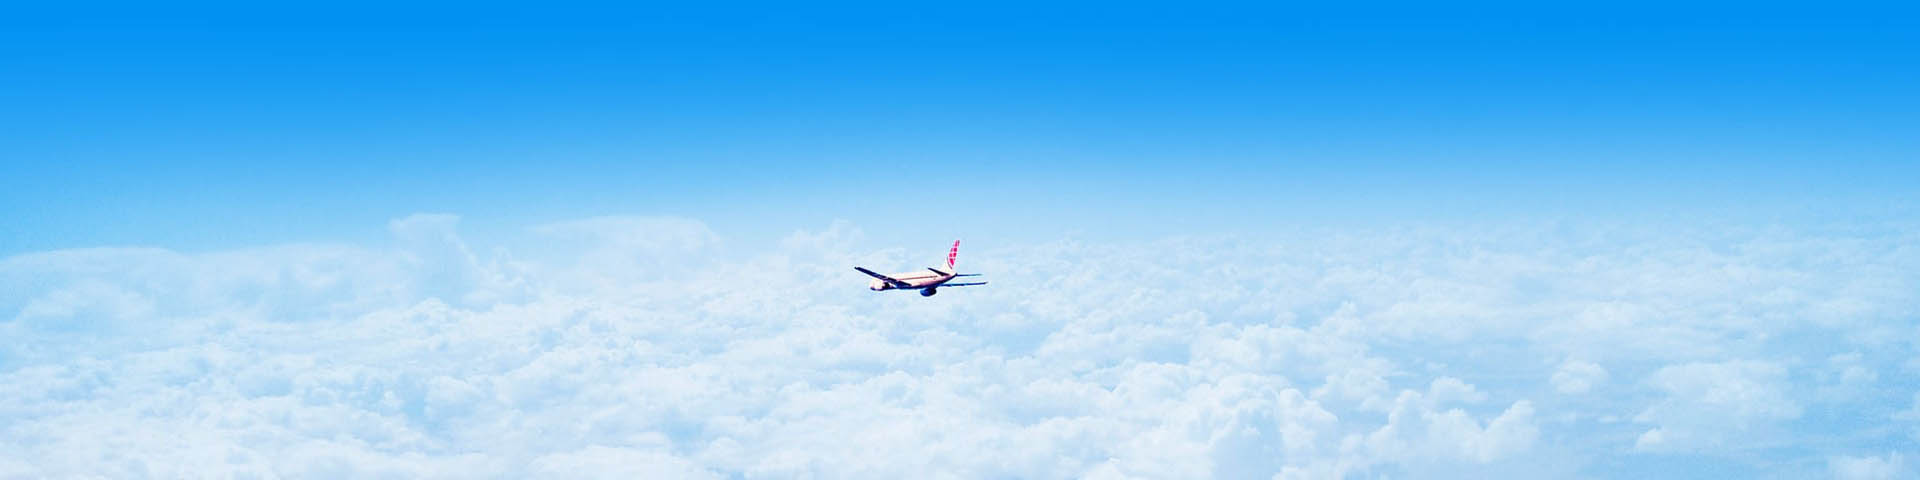 Vliegtuig vliegt boven de wolken in de hemelblauwe lucht